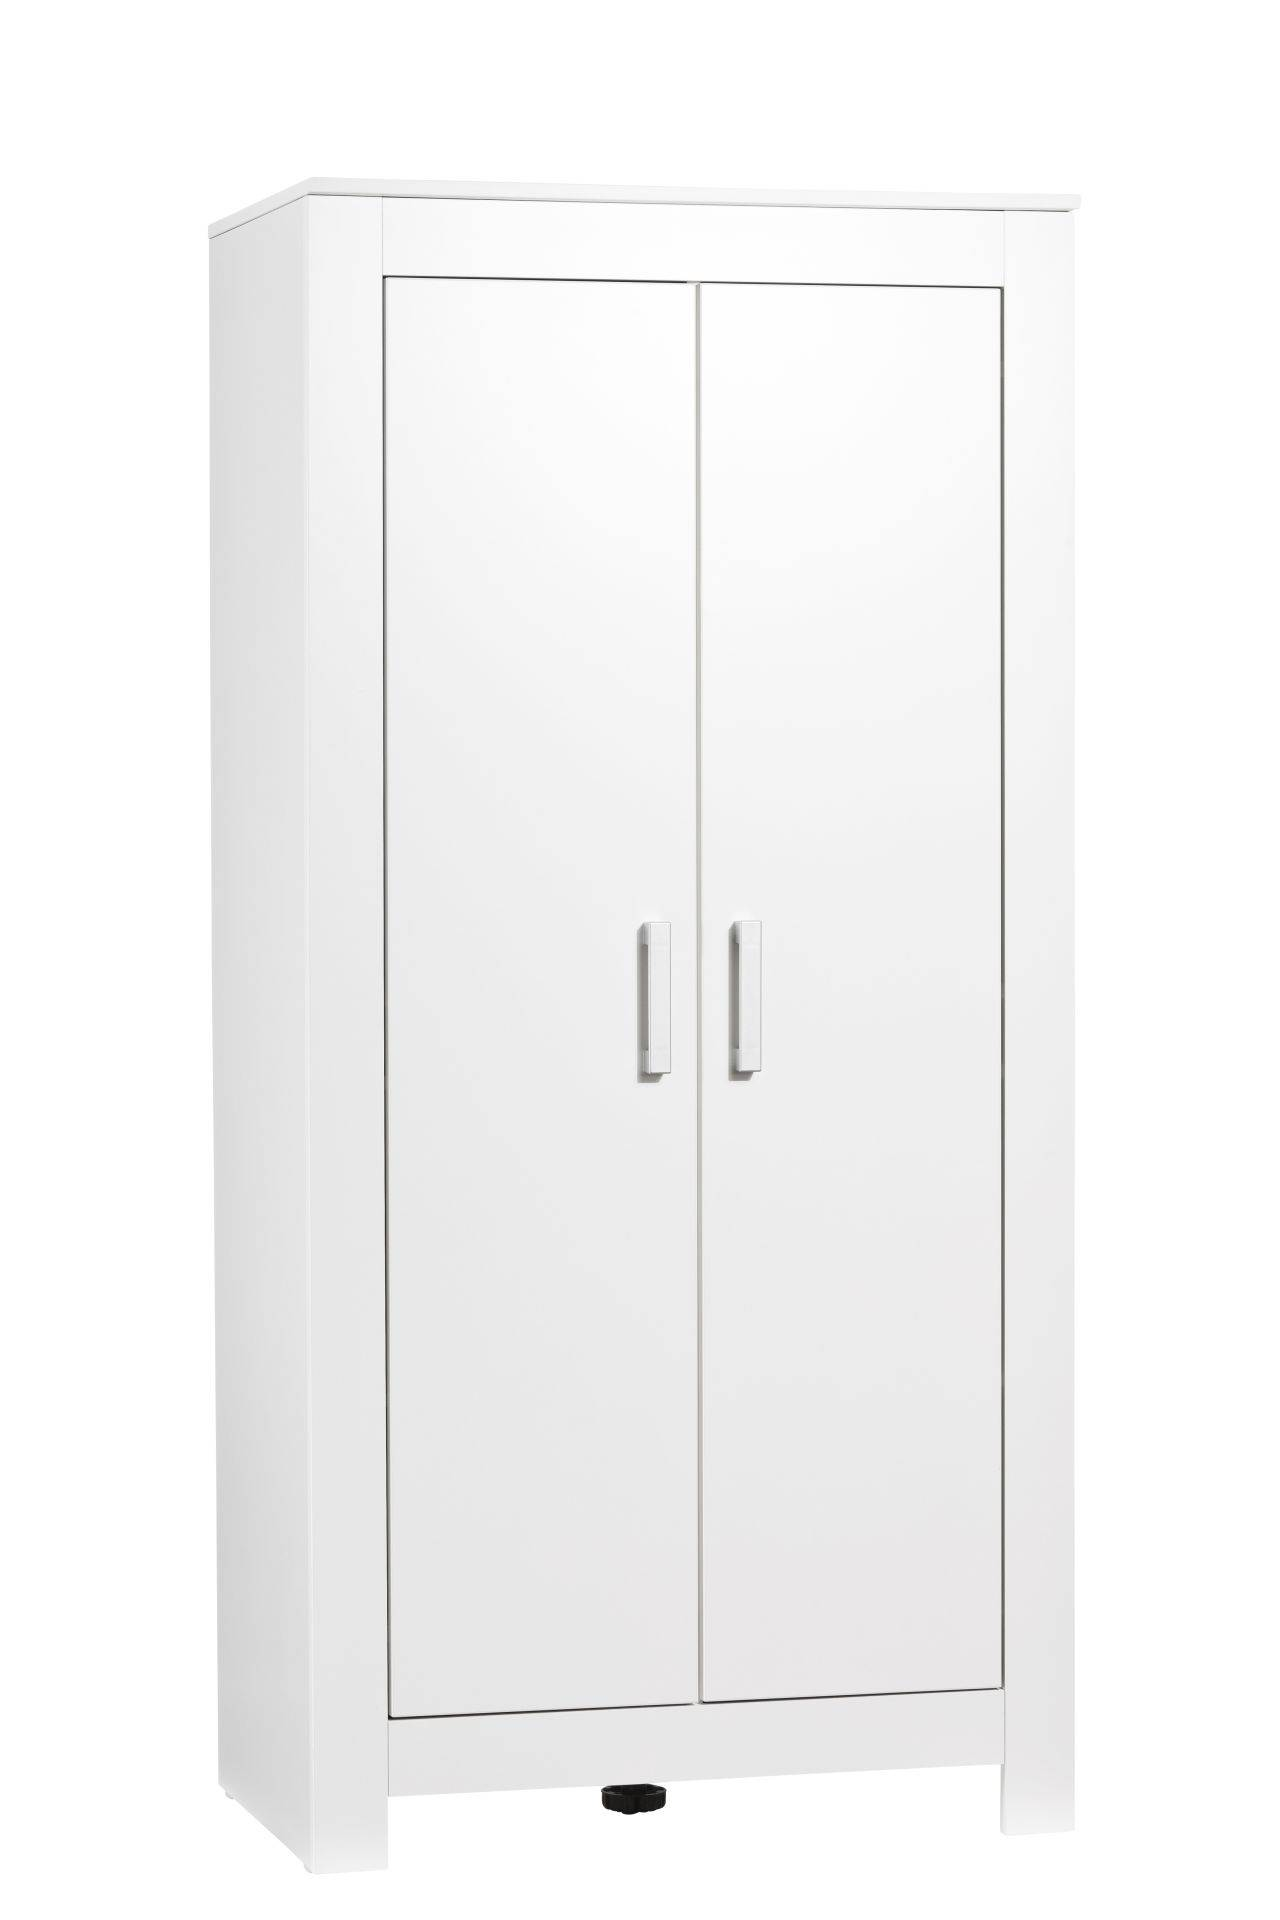 Geuther Marlene two-door child's cupboard;